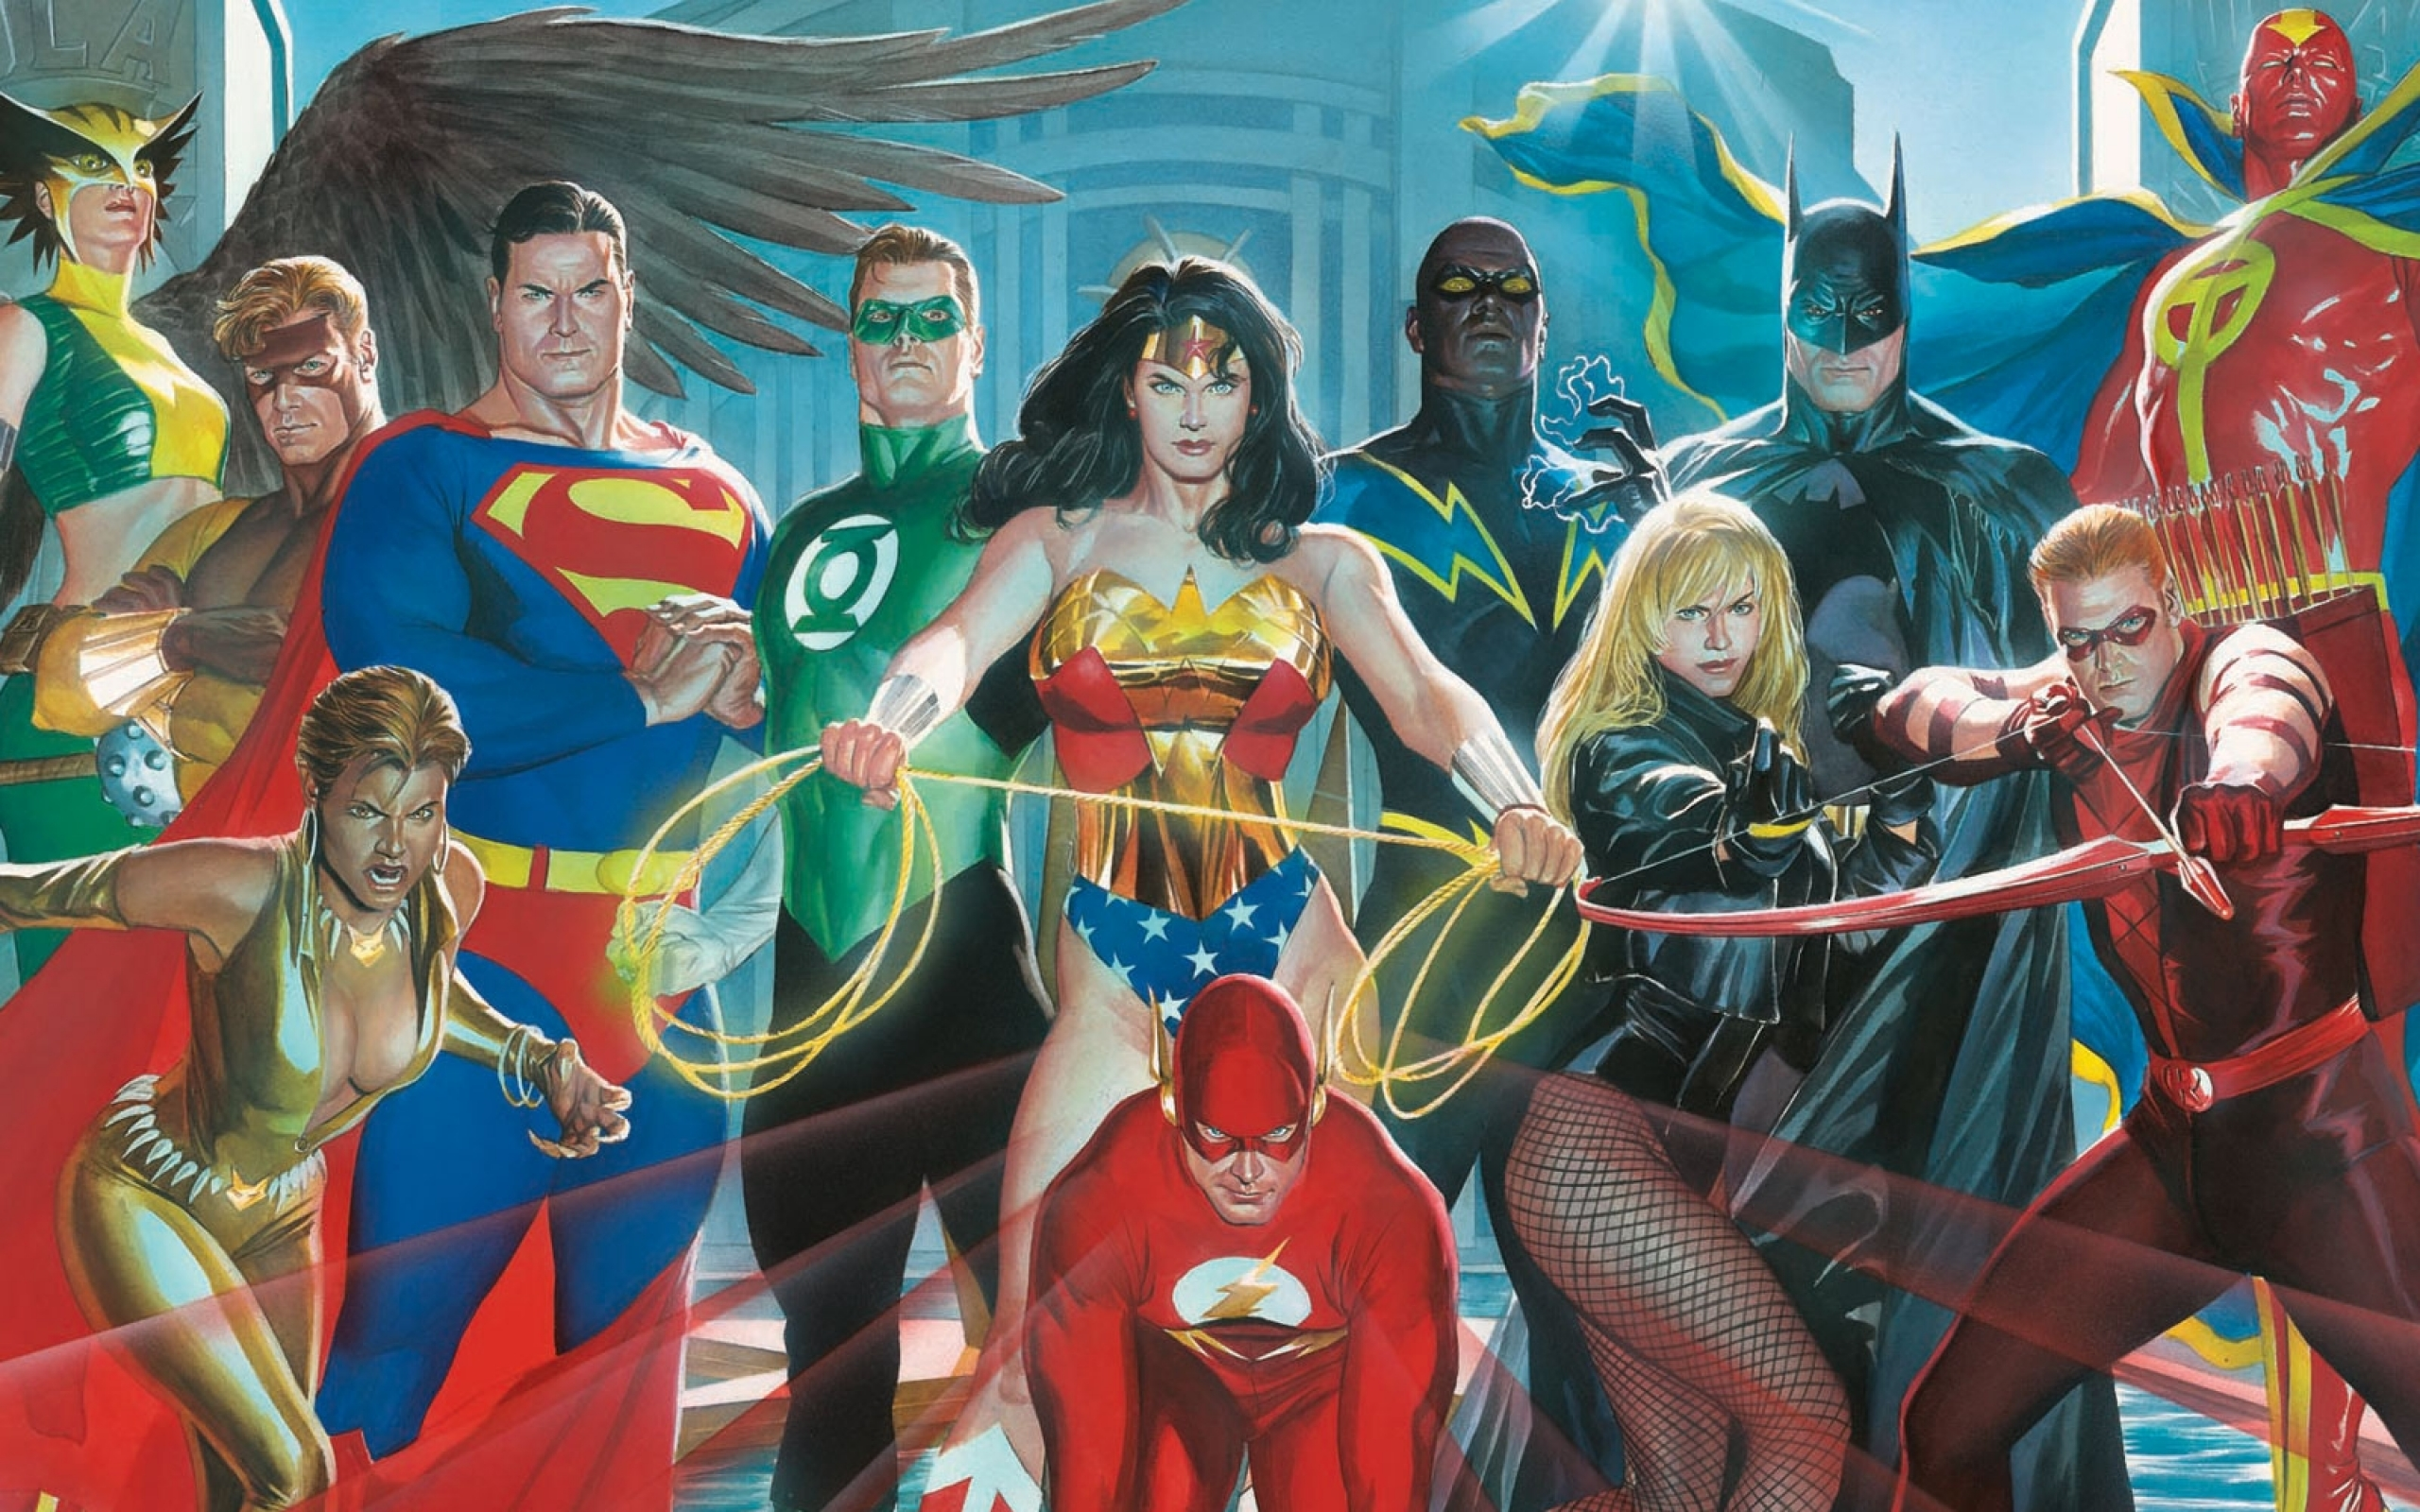 Hd wallpaper justice league - Hd Wallpaper Justice League 13